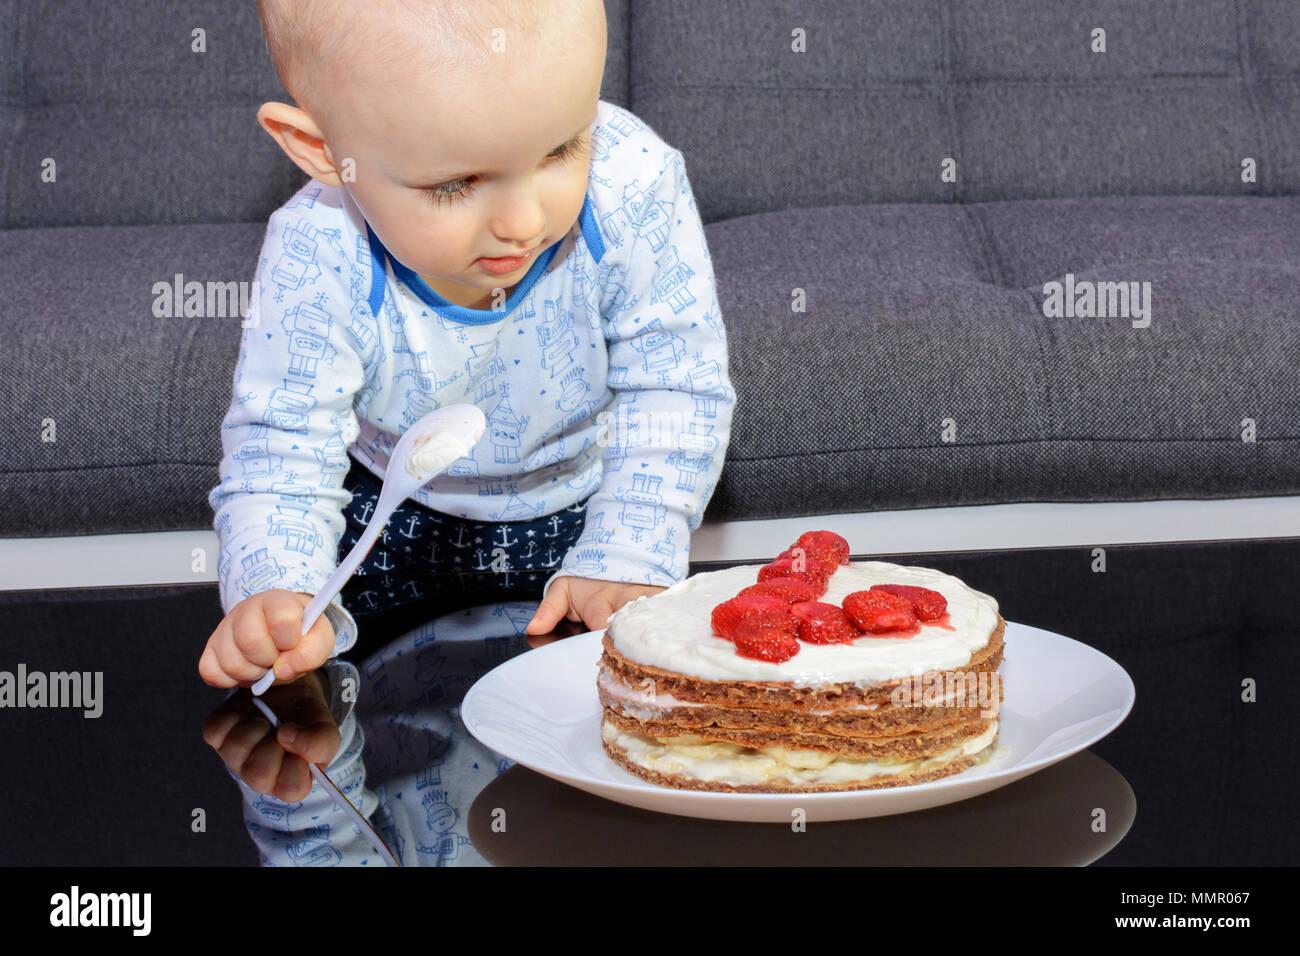 First Birthday Celebration Of A Little Boy Little Boy Eating